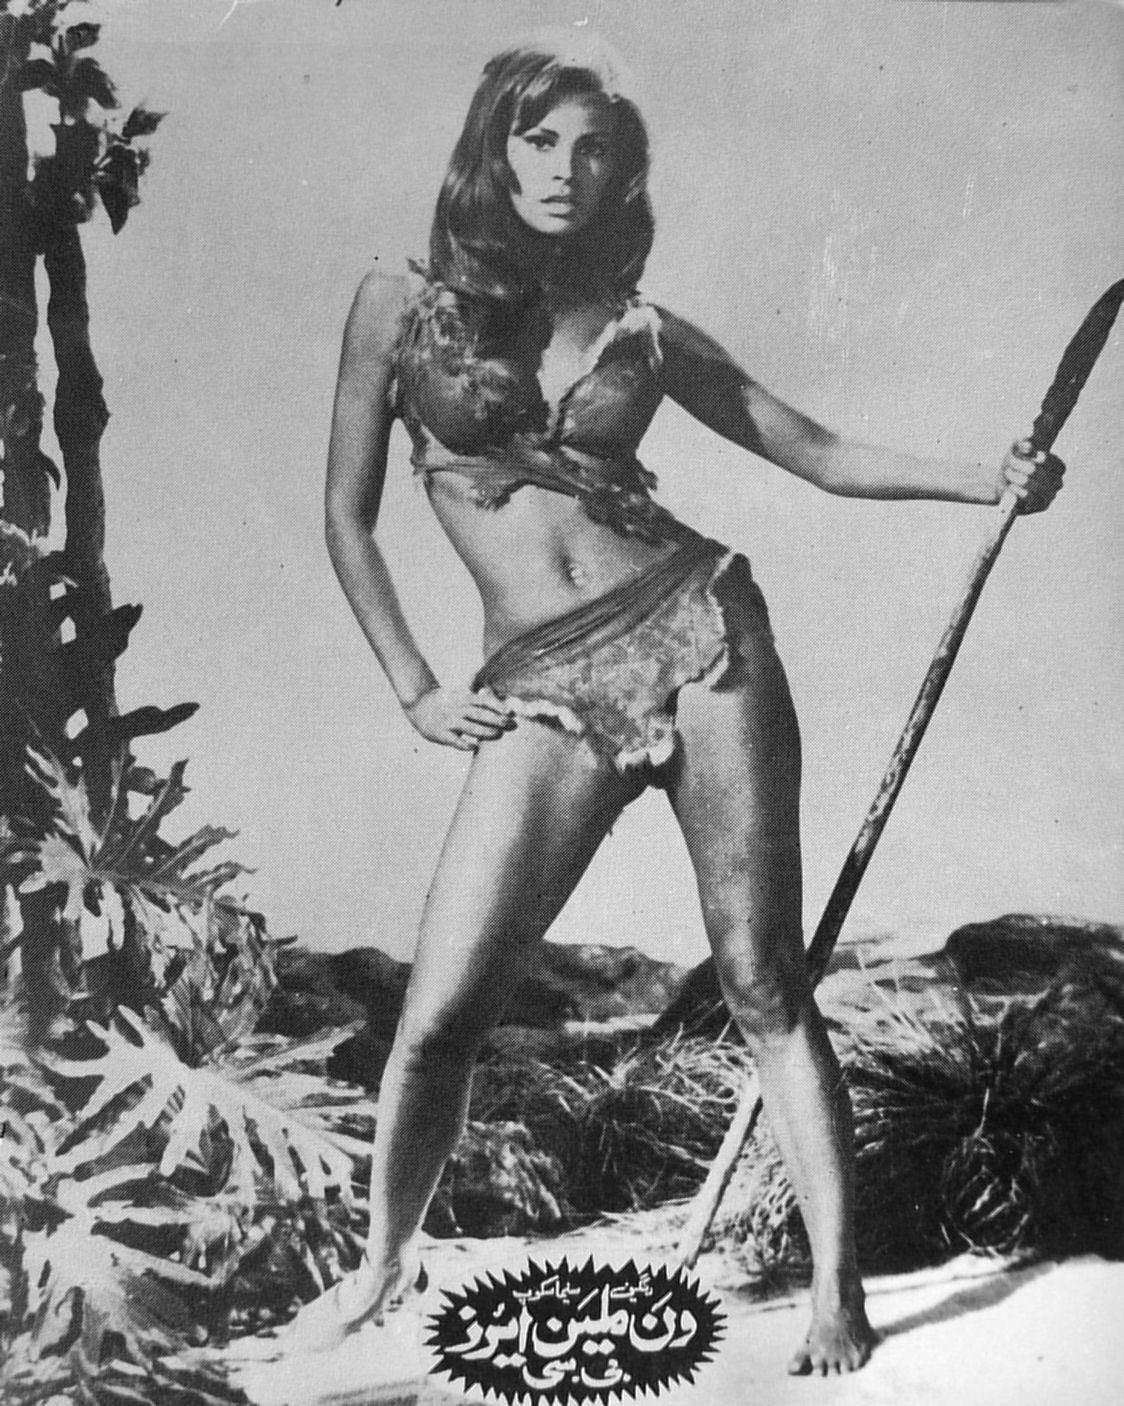 Raquel Welch in One Million Years B.C. (1966)